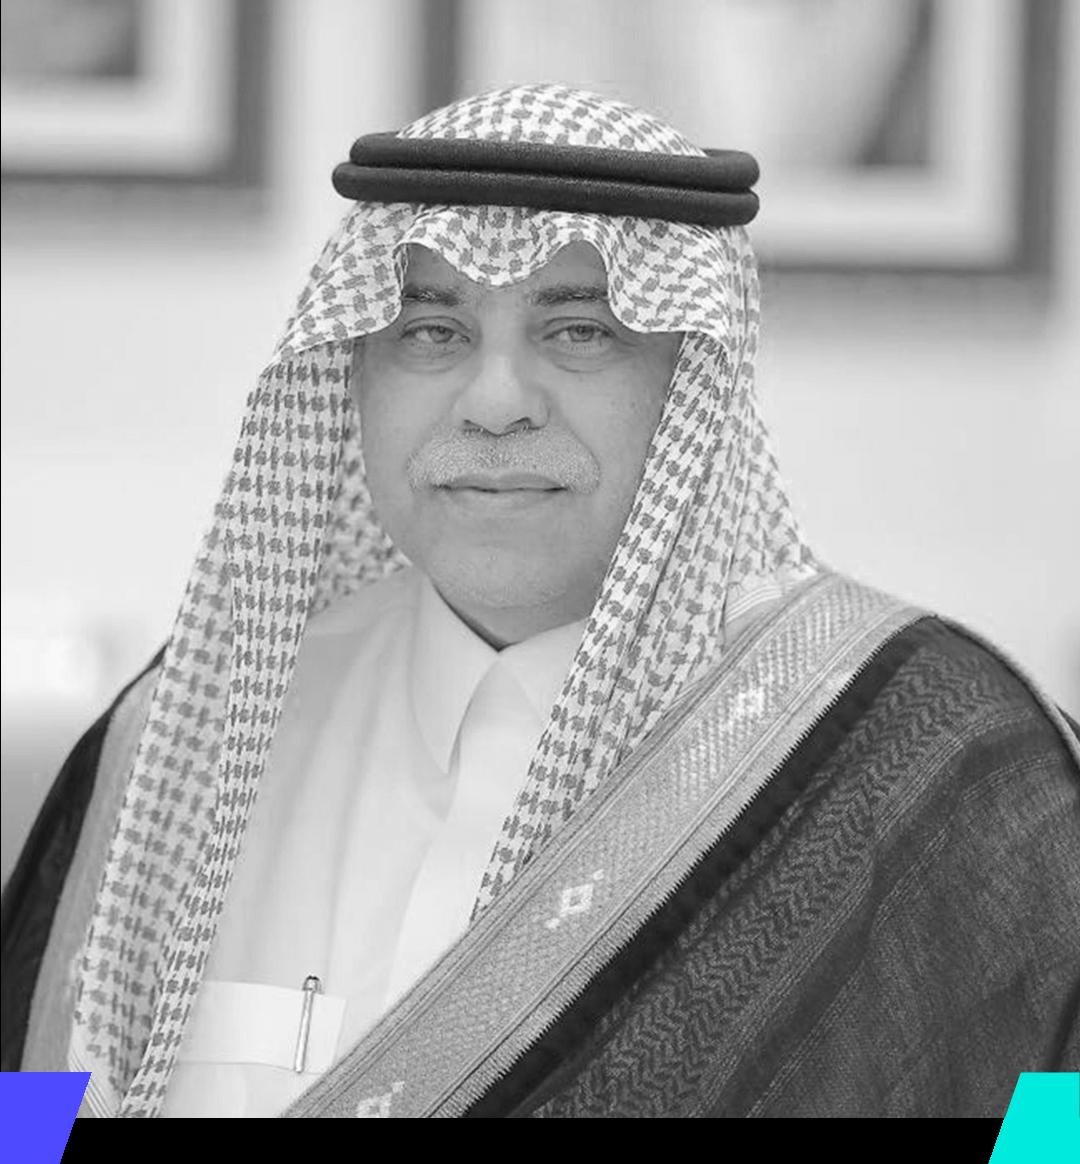 majid-bin-abdullah-al-qasabi.png